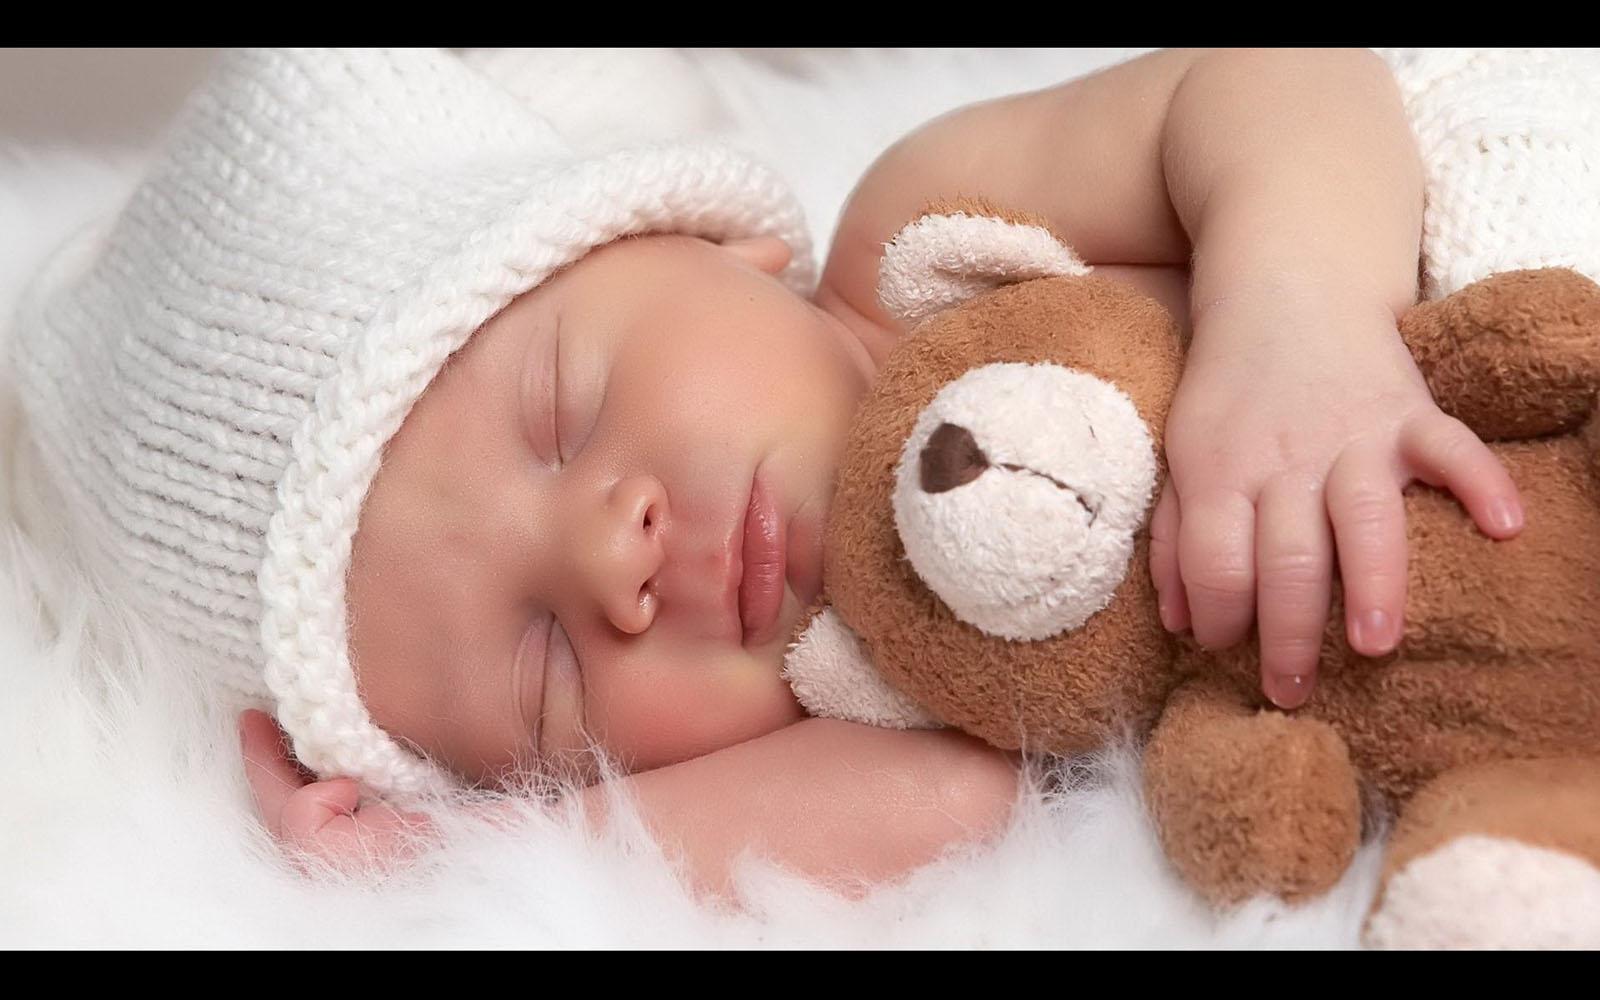 XS Wallpapers HD Cute Babies Hd Wallpapers 1600x1000